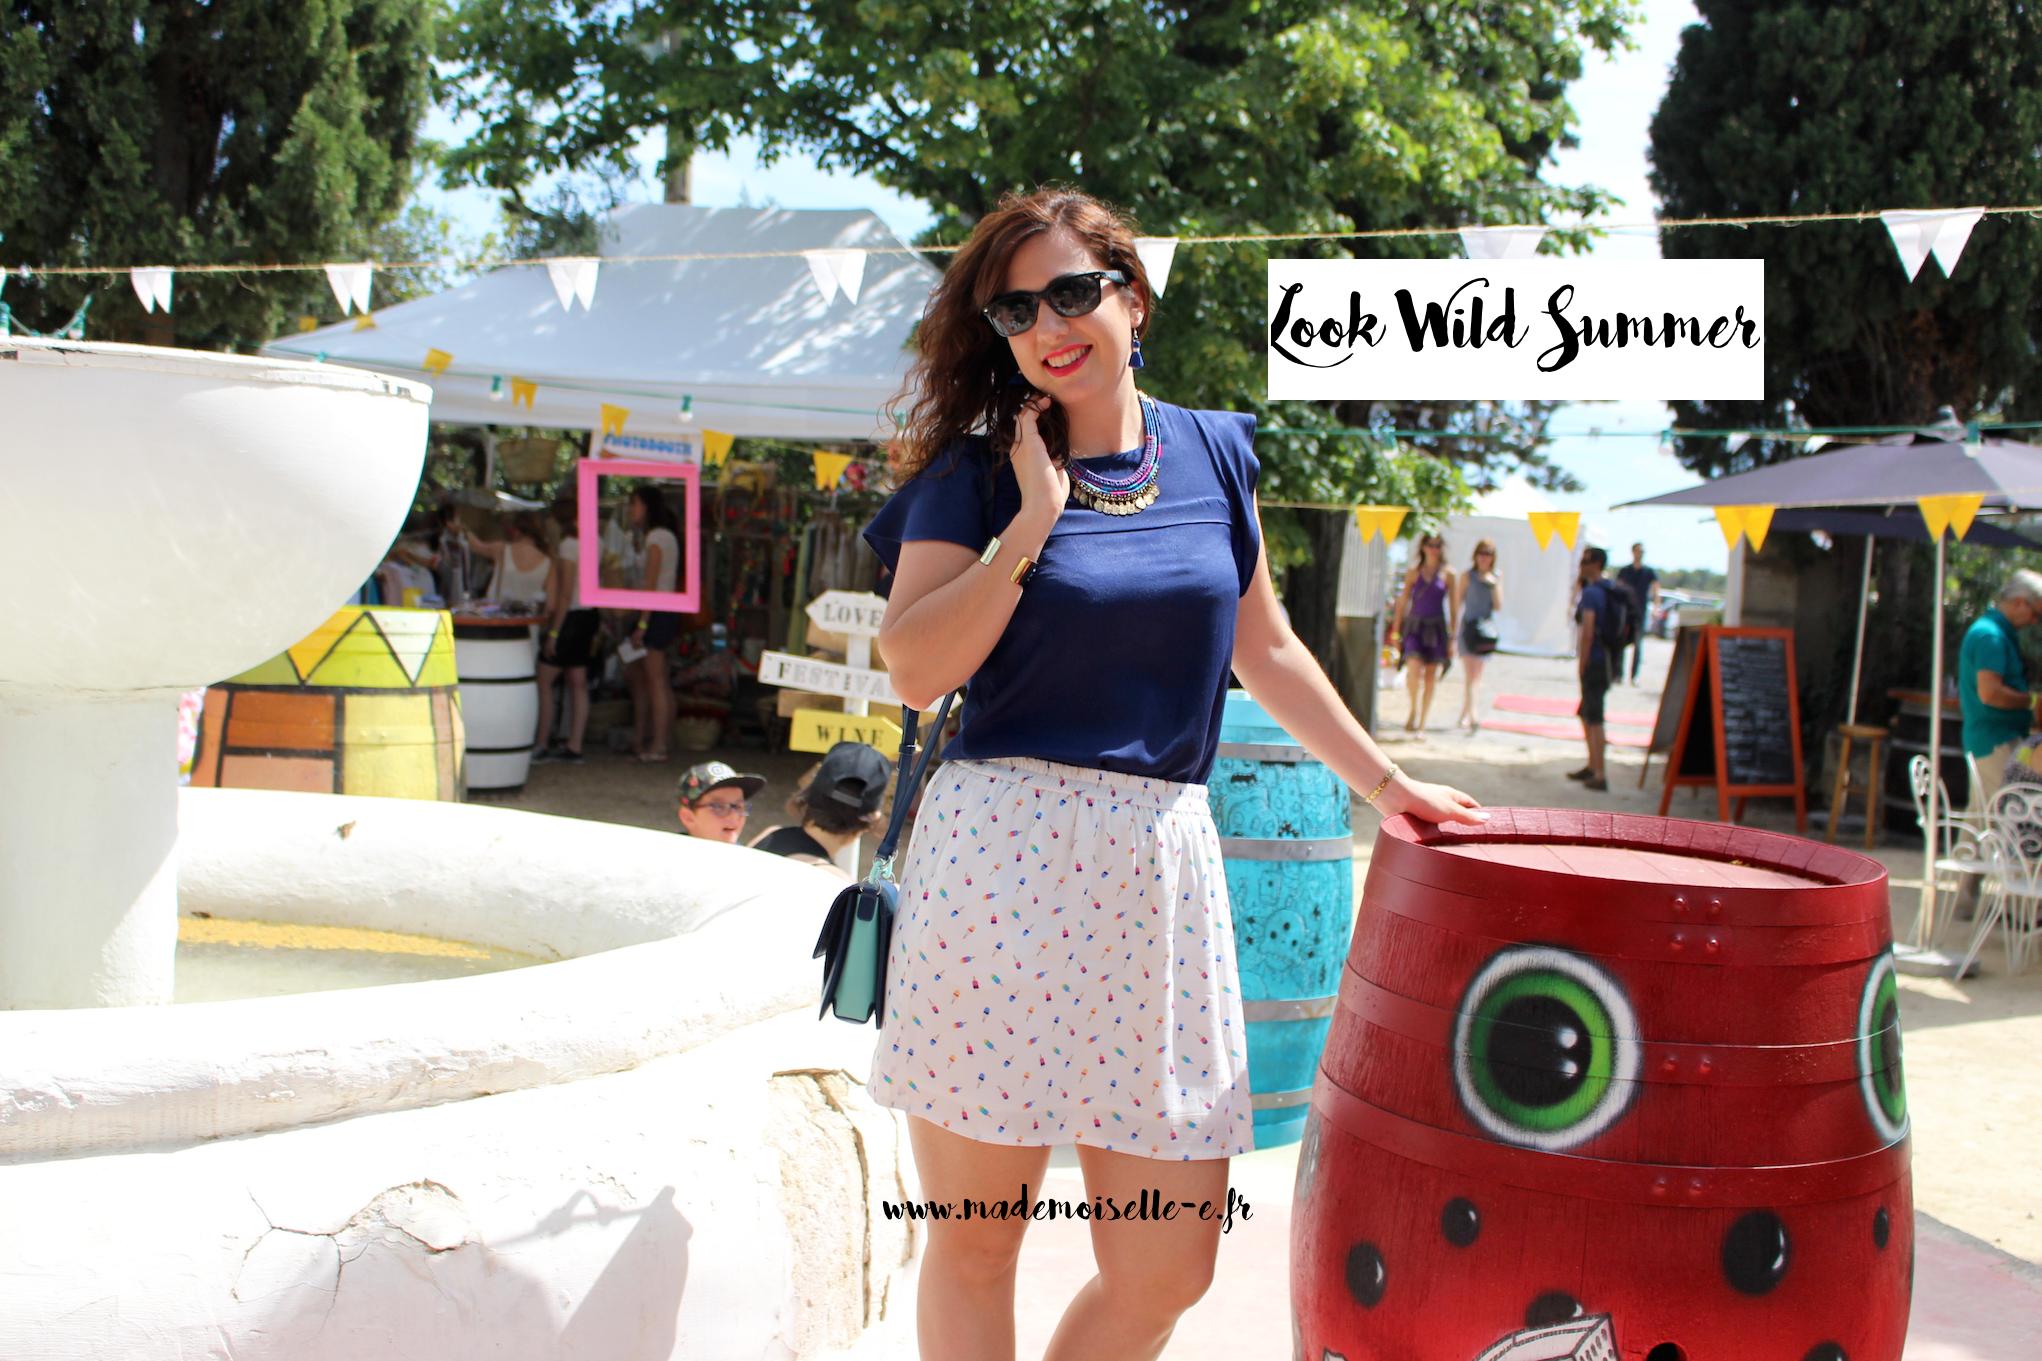 Wild Summer presentation_mademoiselle-e